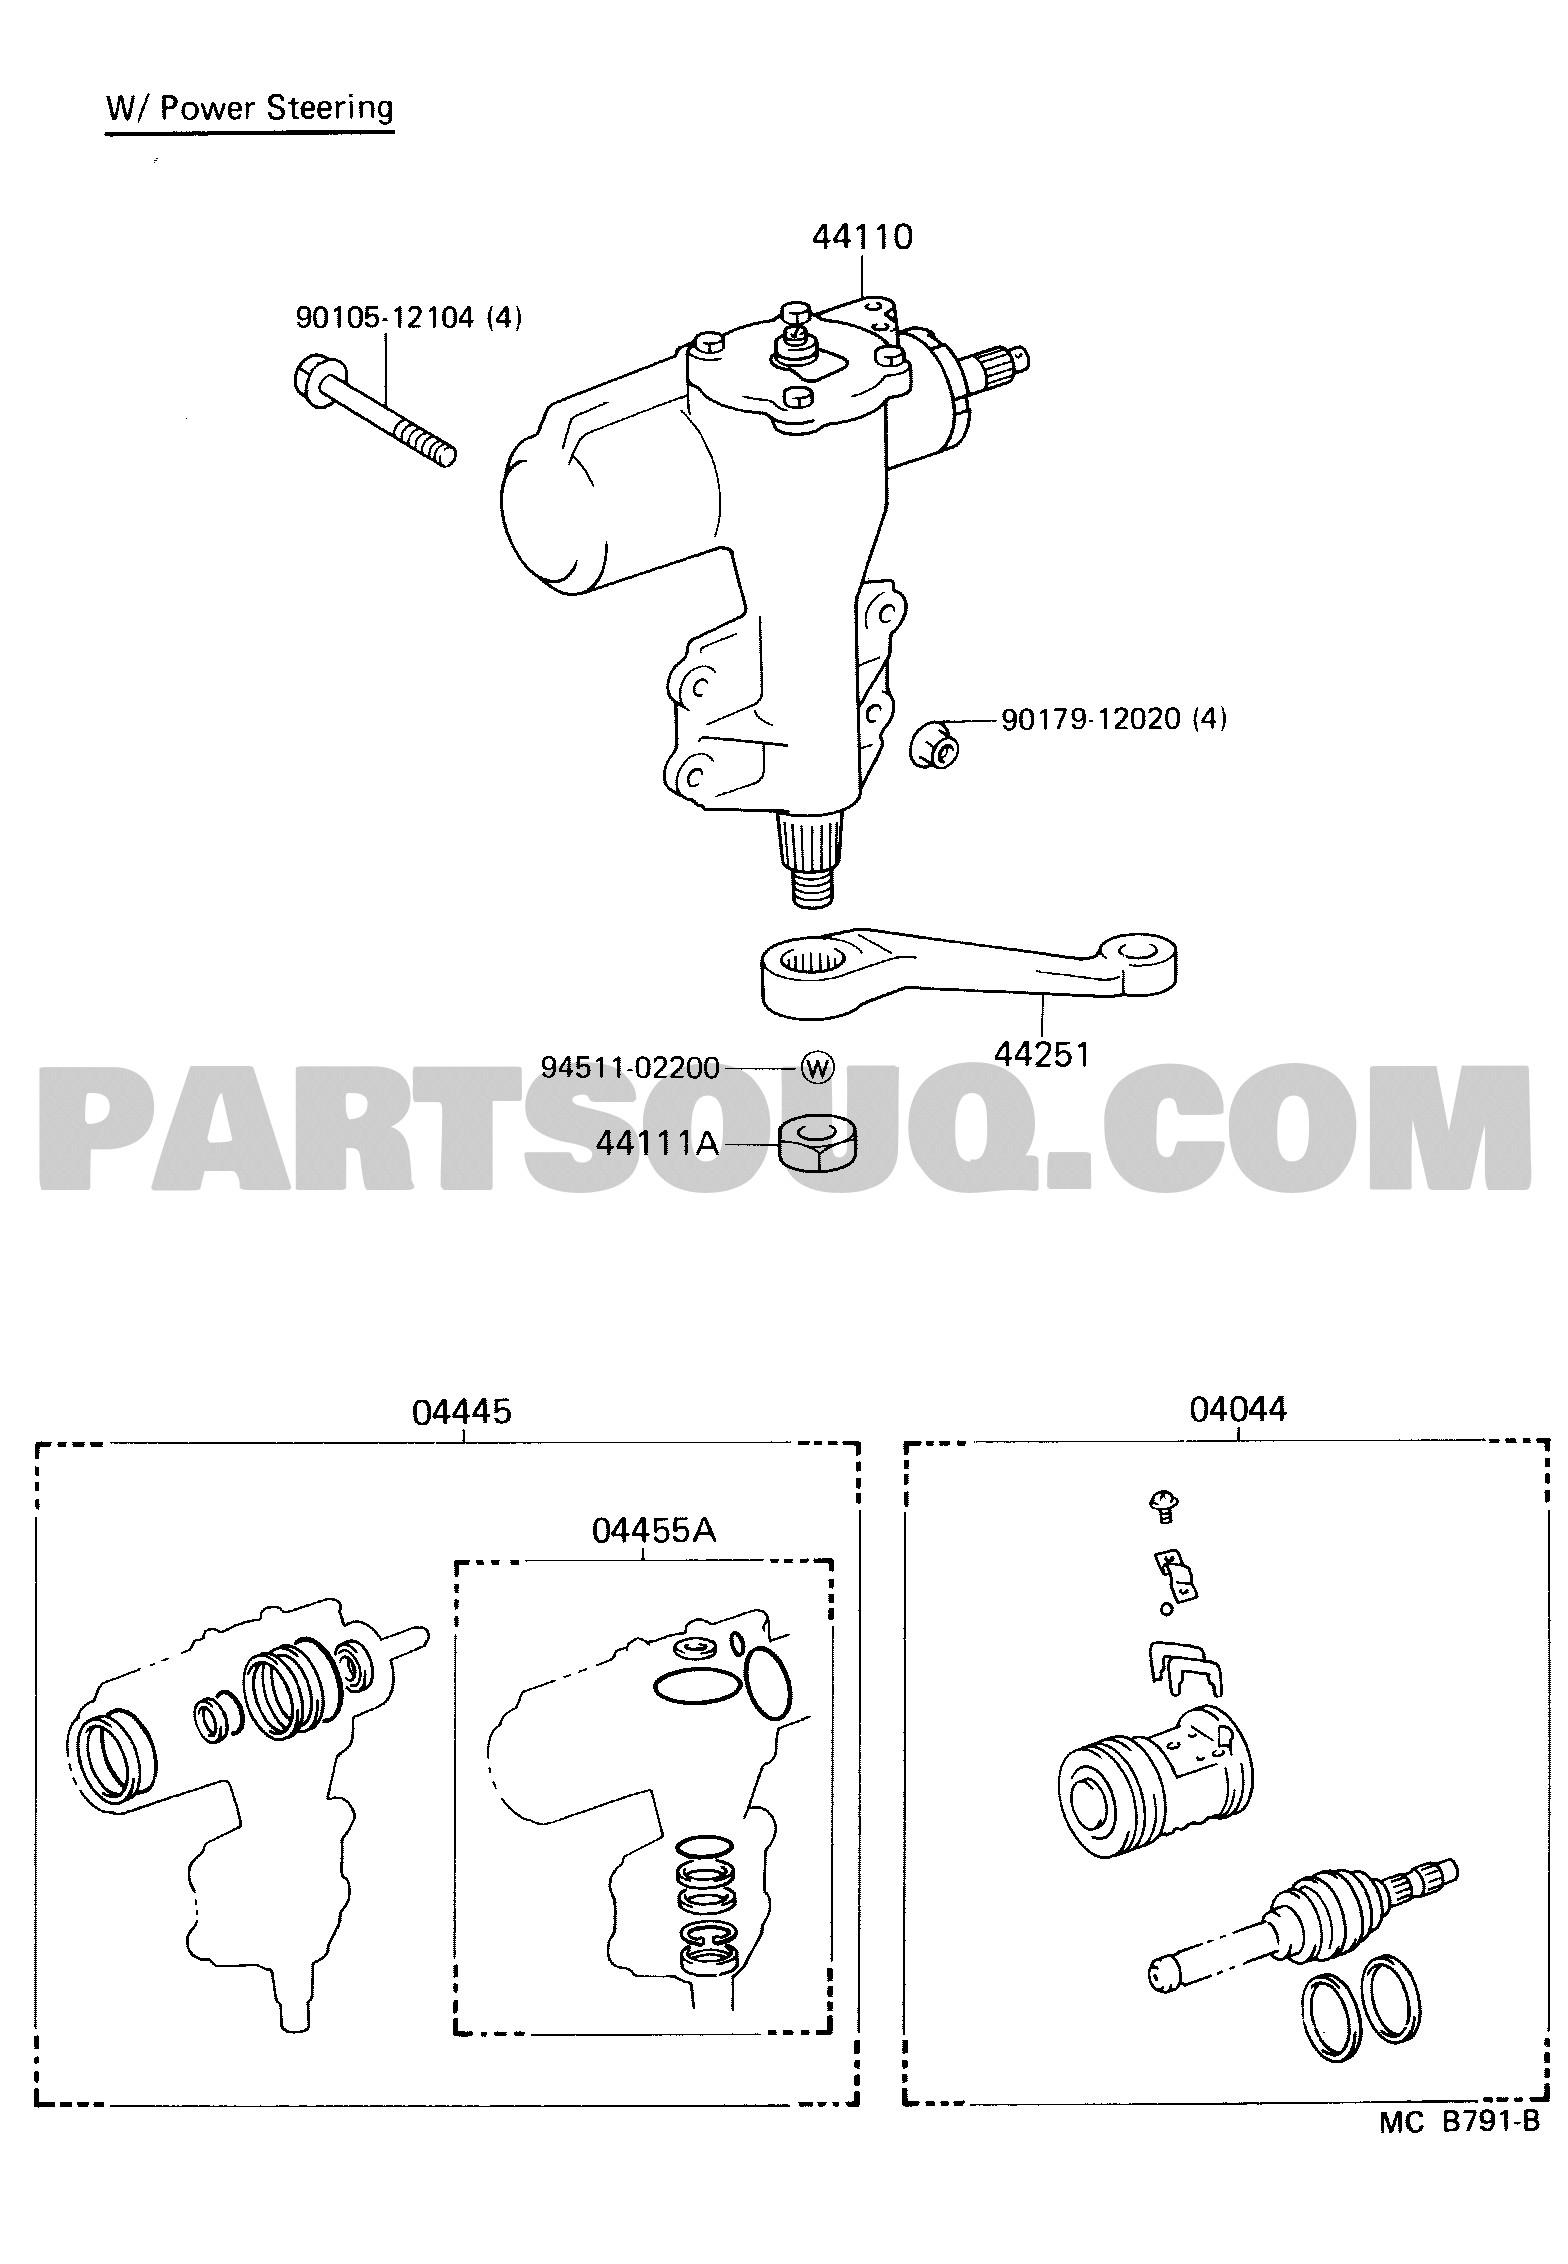 how do you say wiring harness in spanish data wiring diagram u2022 rh vitaleapp co Trailer Wiring Harness Automotive Wiring Harness